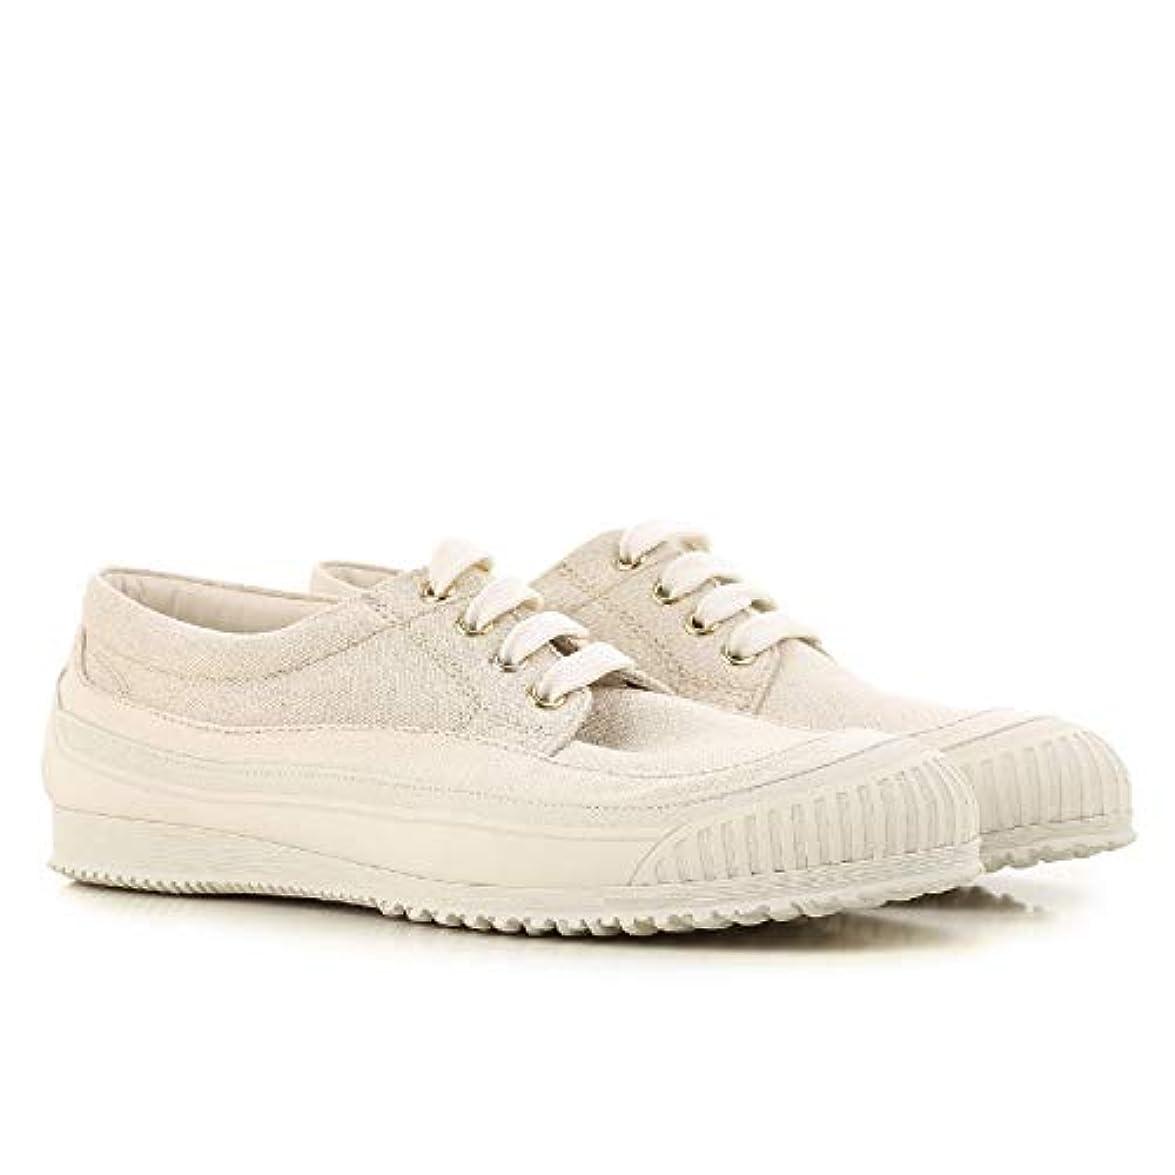 Hogan Sneakers Donna In Tessuto Beige Chiaro